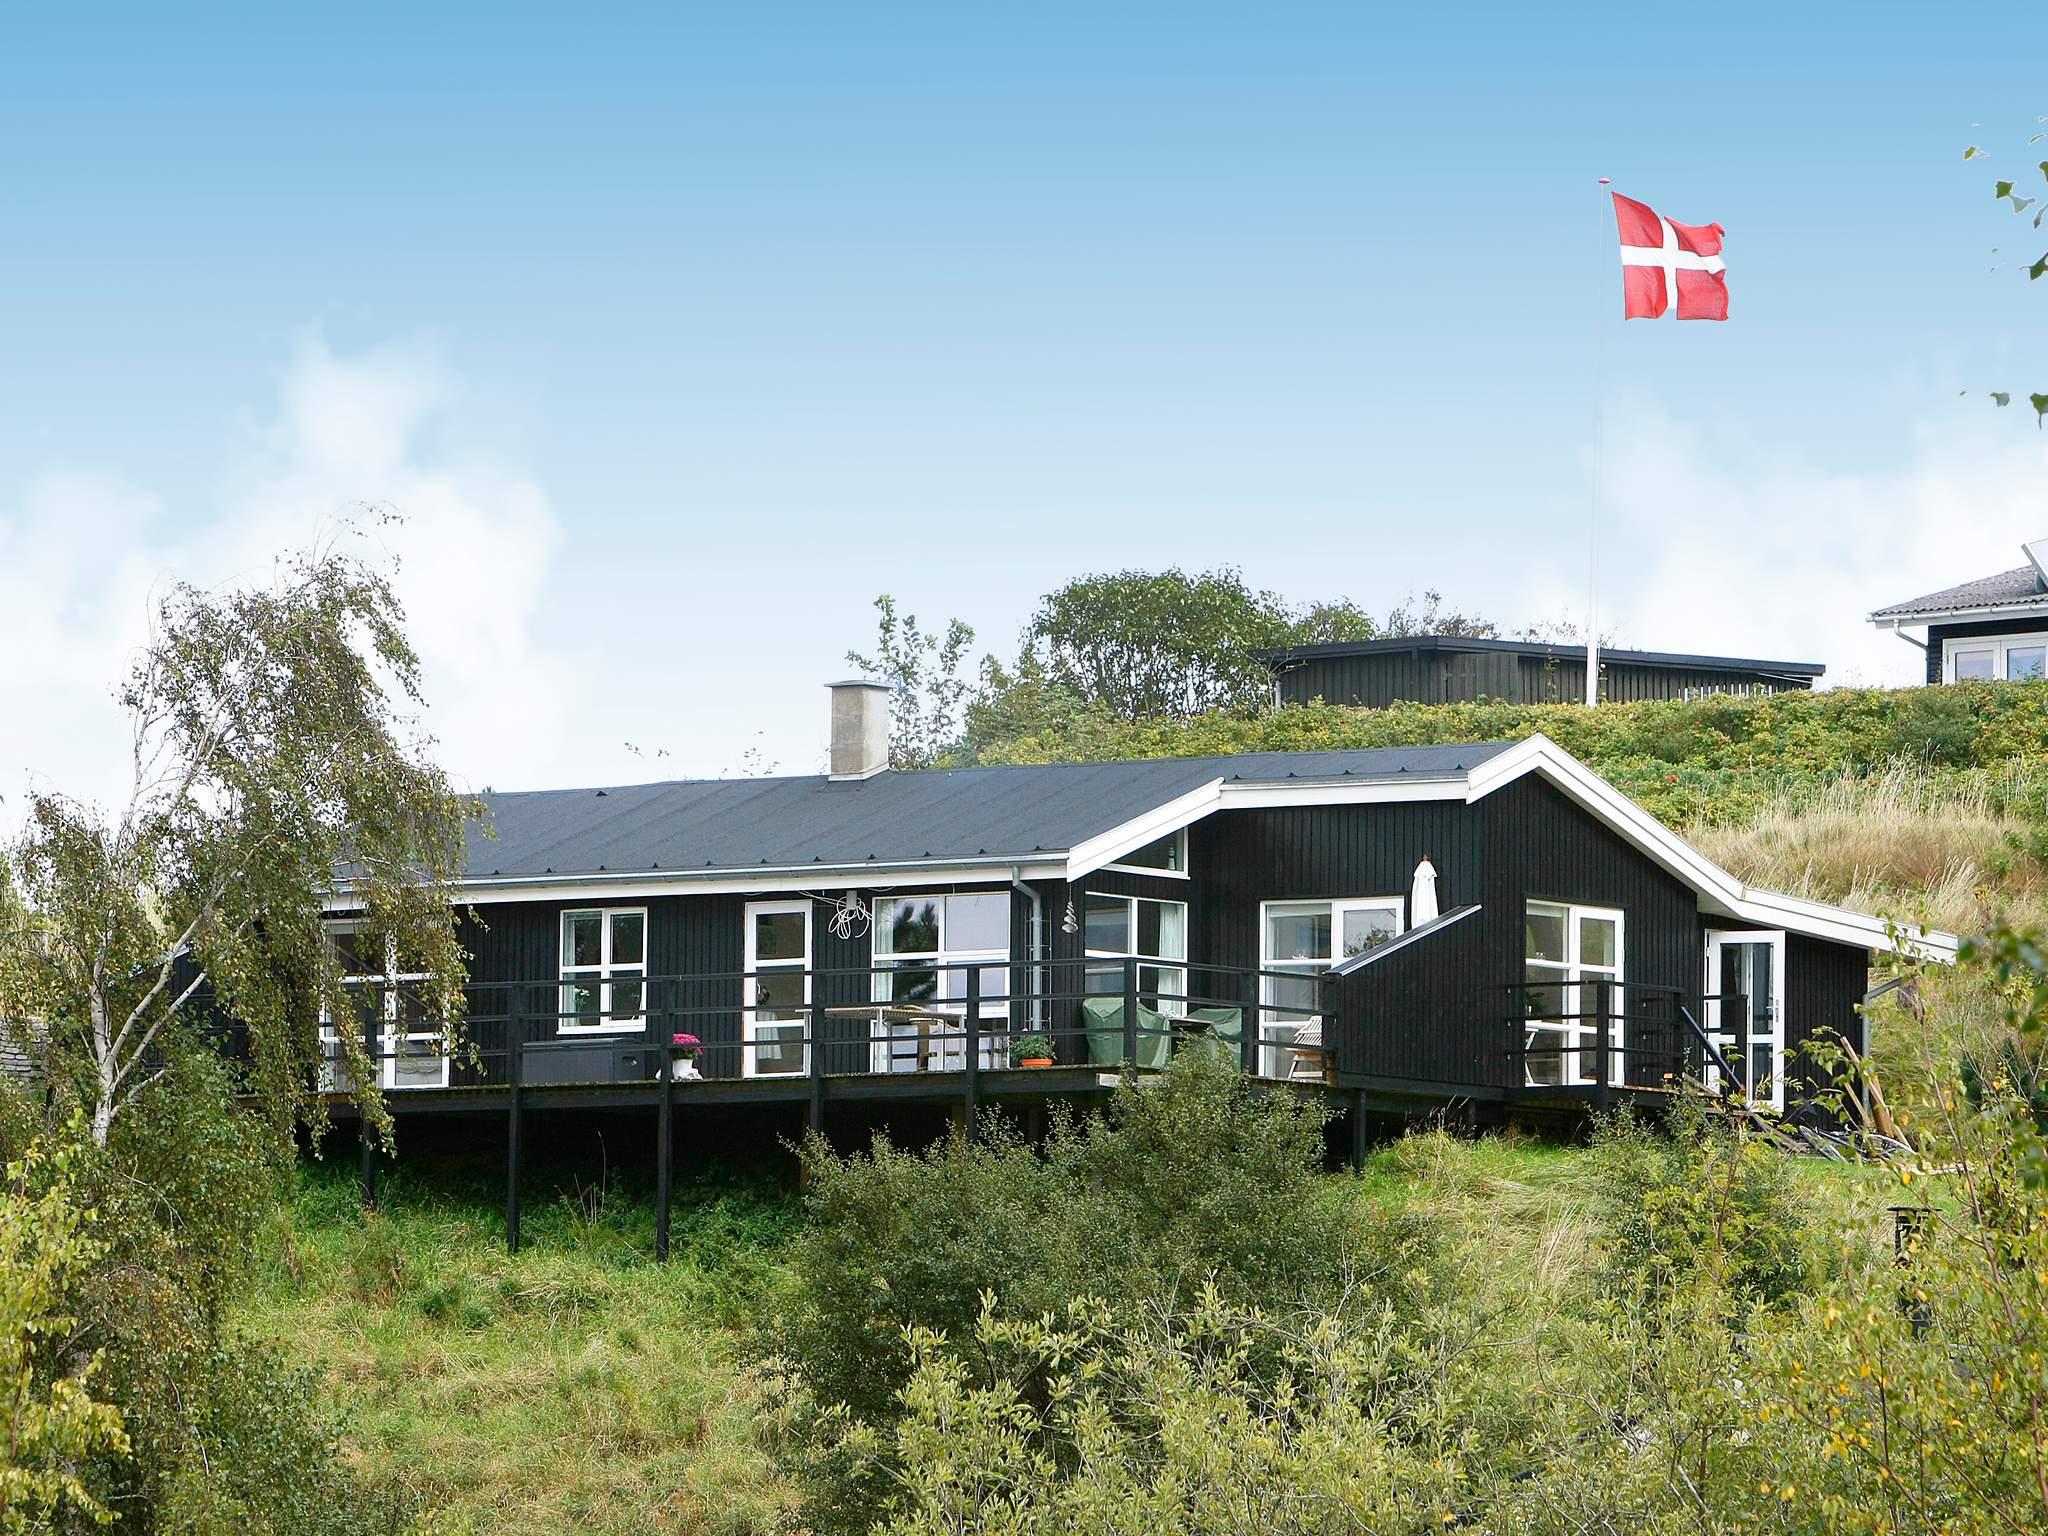 Maison de vacances Helgenæs (674636), Knebel, , Jutland Est, Danemark, image 1